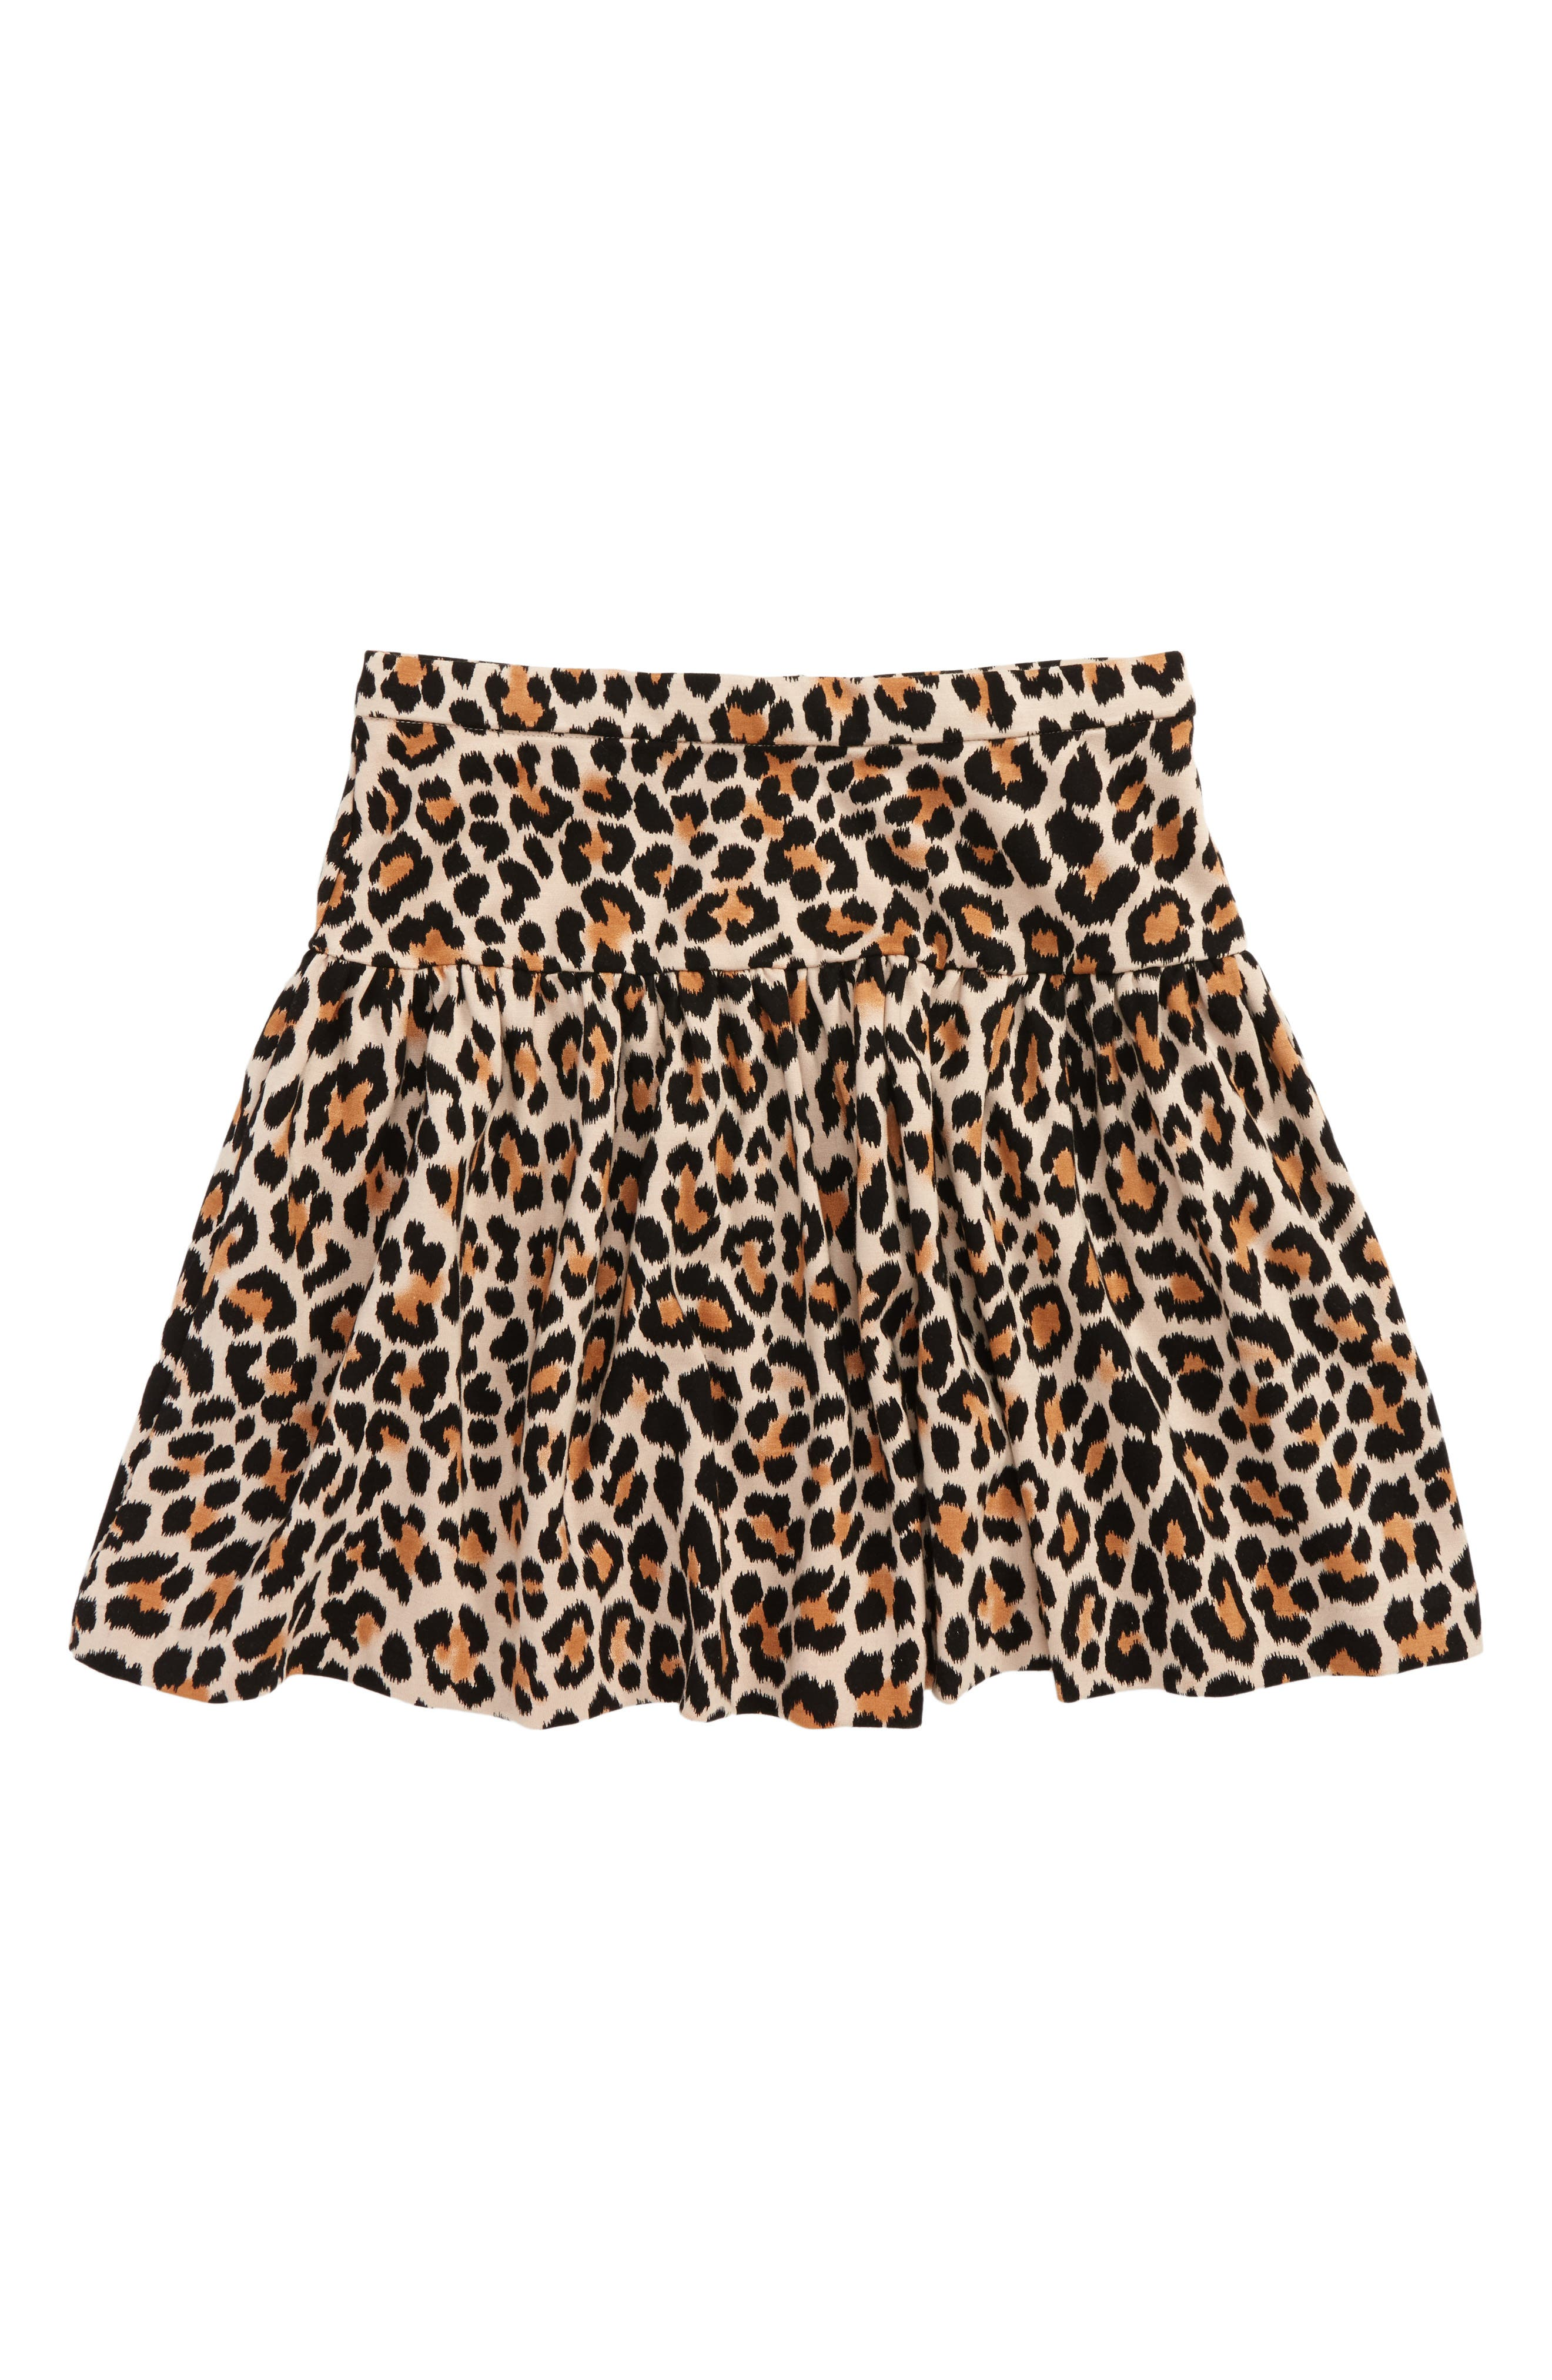 kate spade new york leopard print skirt (Big Girls)